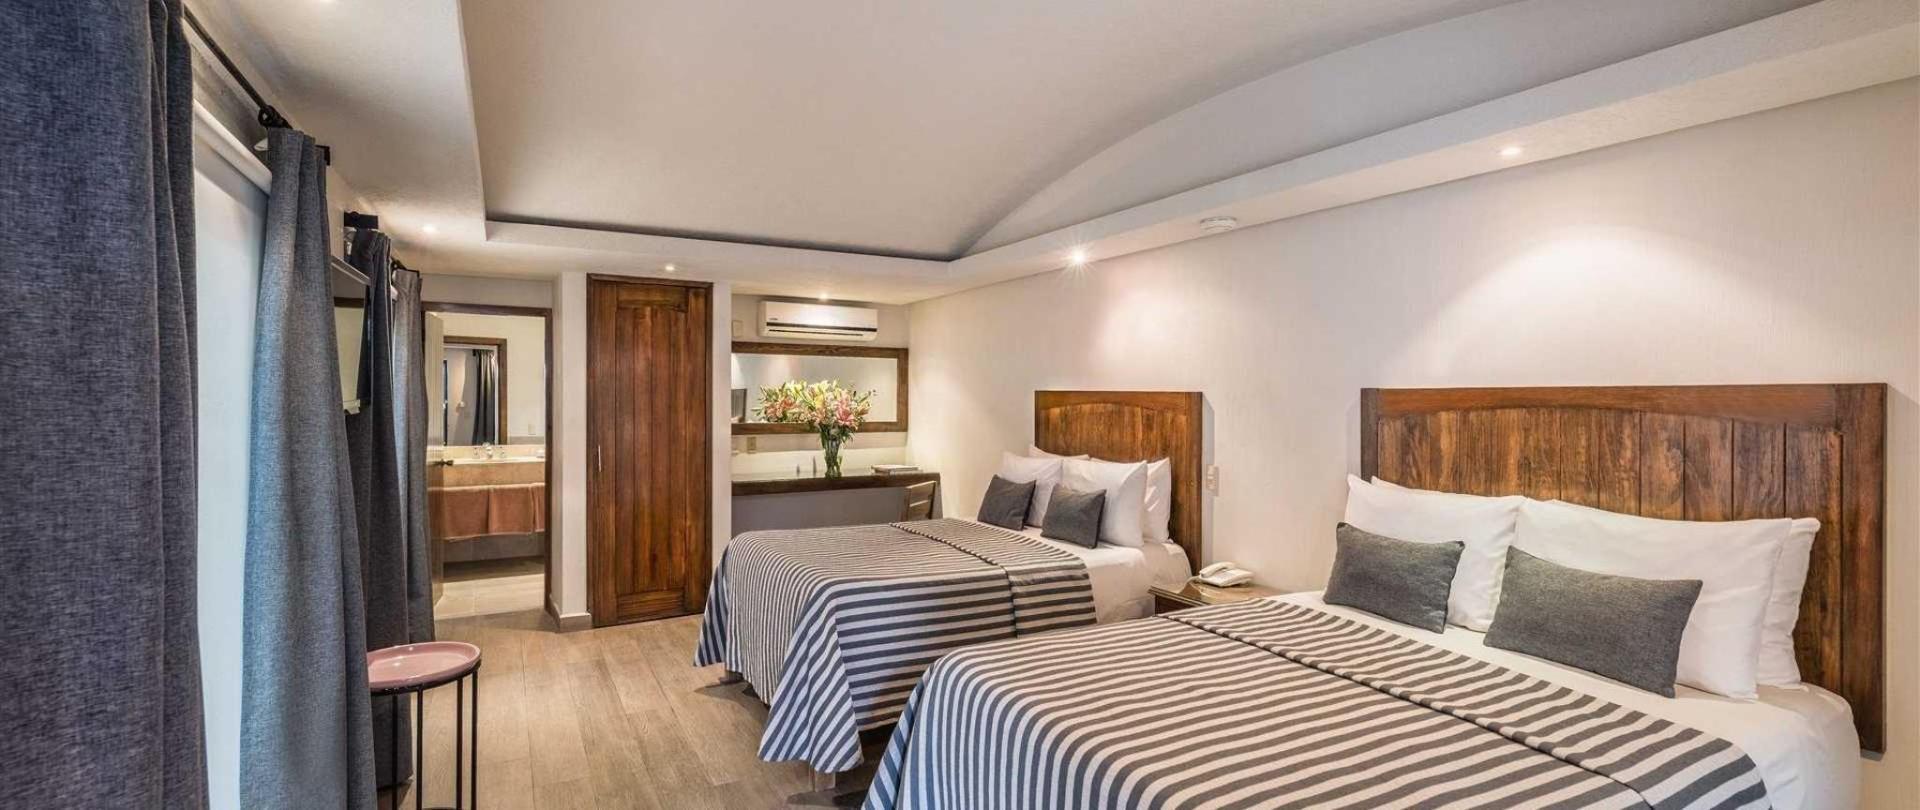 homepage-la-abadia-hotel-guanajuato-mexico4.jpeg